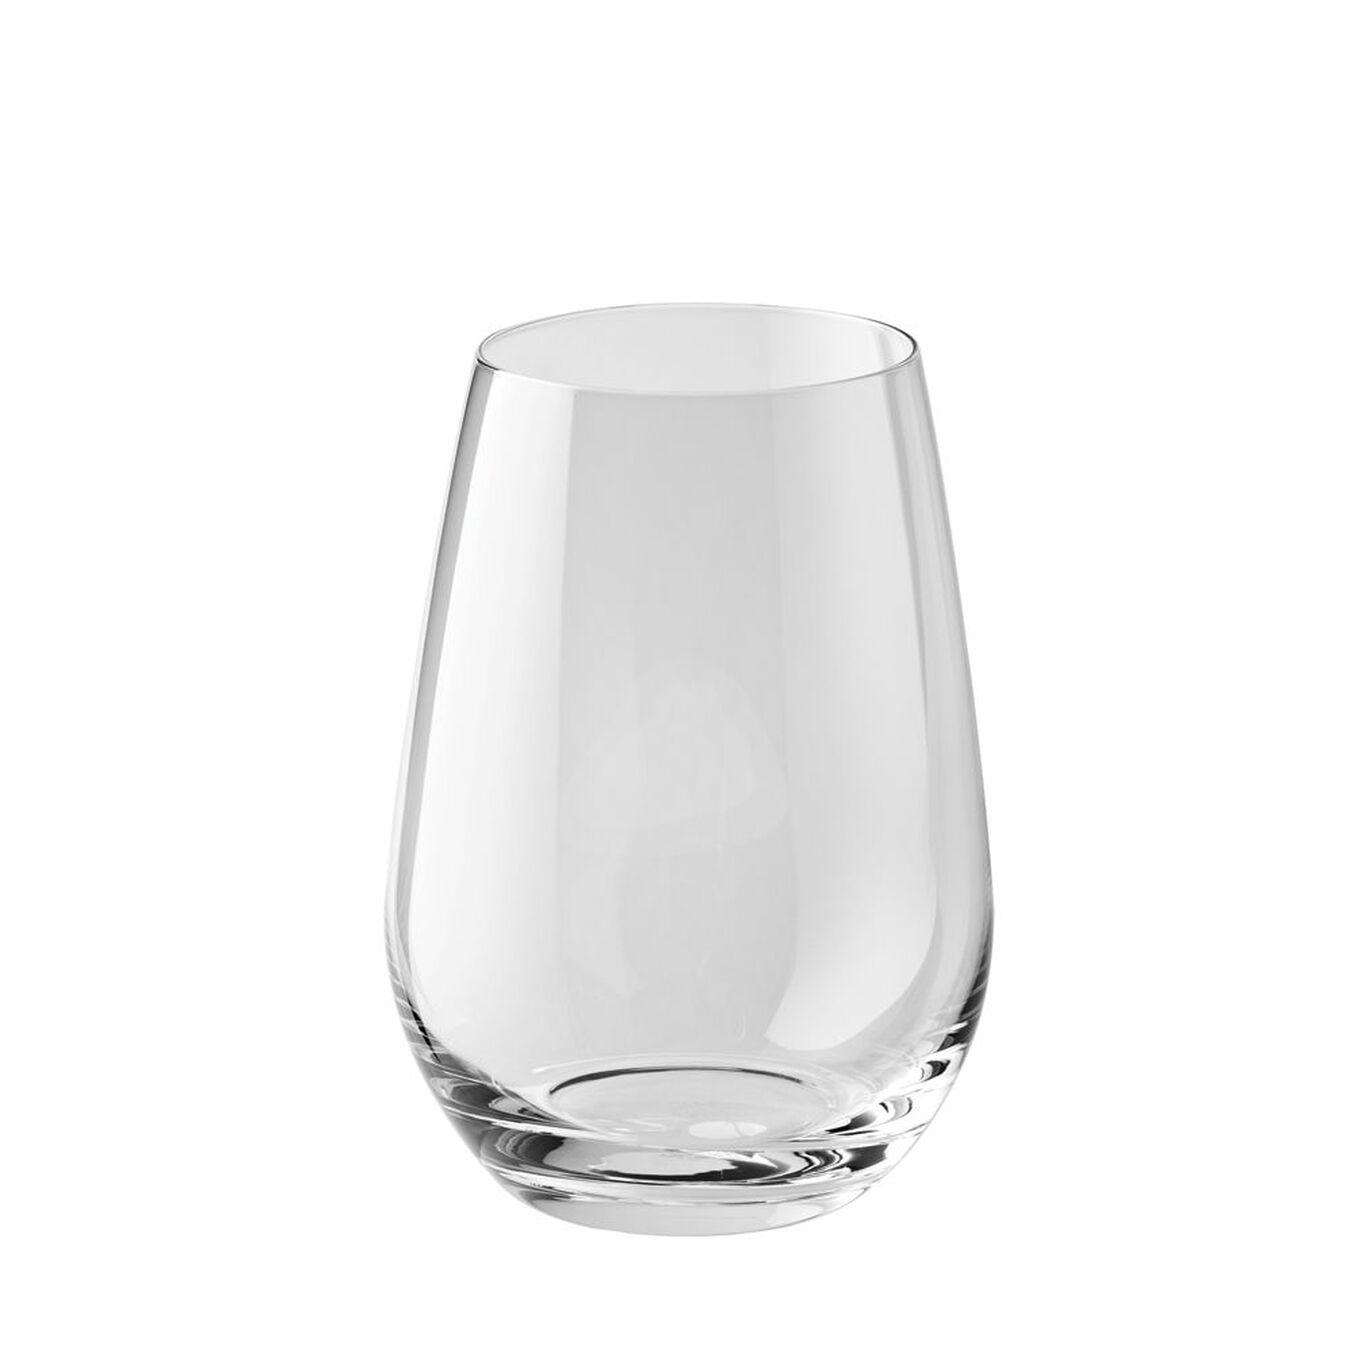 6 Piece Beverage Glass set,,large 1